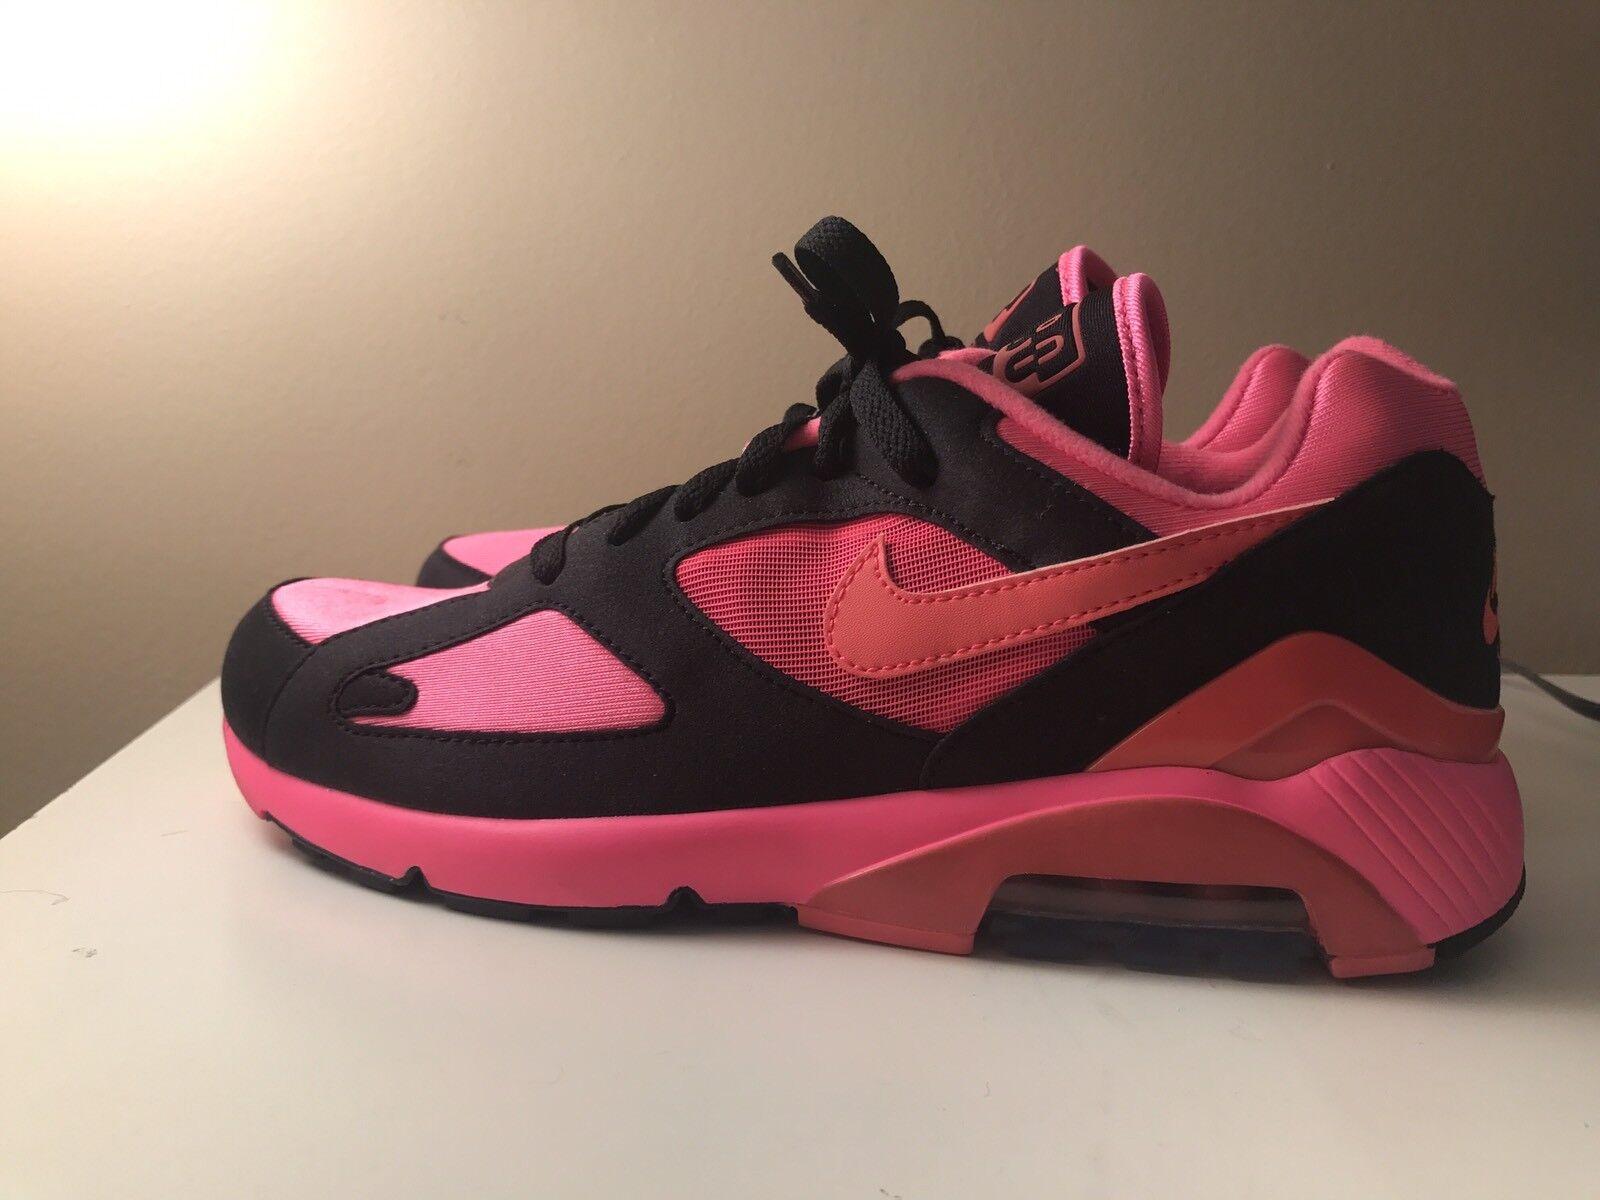 Nike Air Max 180 Comme Des Garcons Black Pink CDG DSM